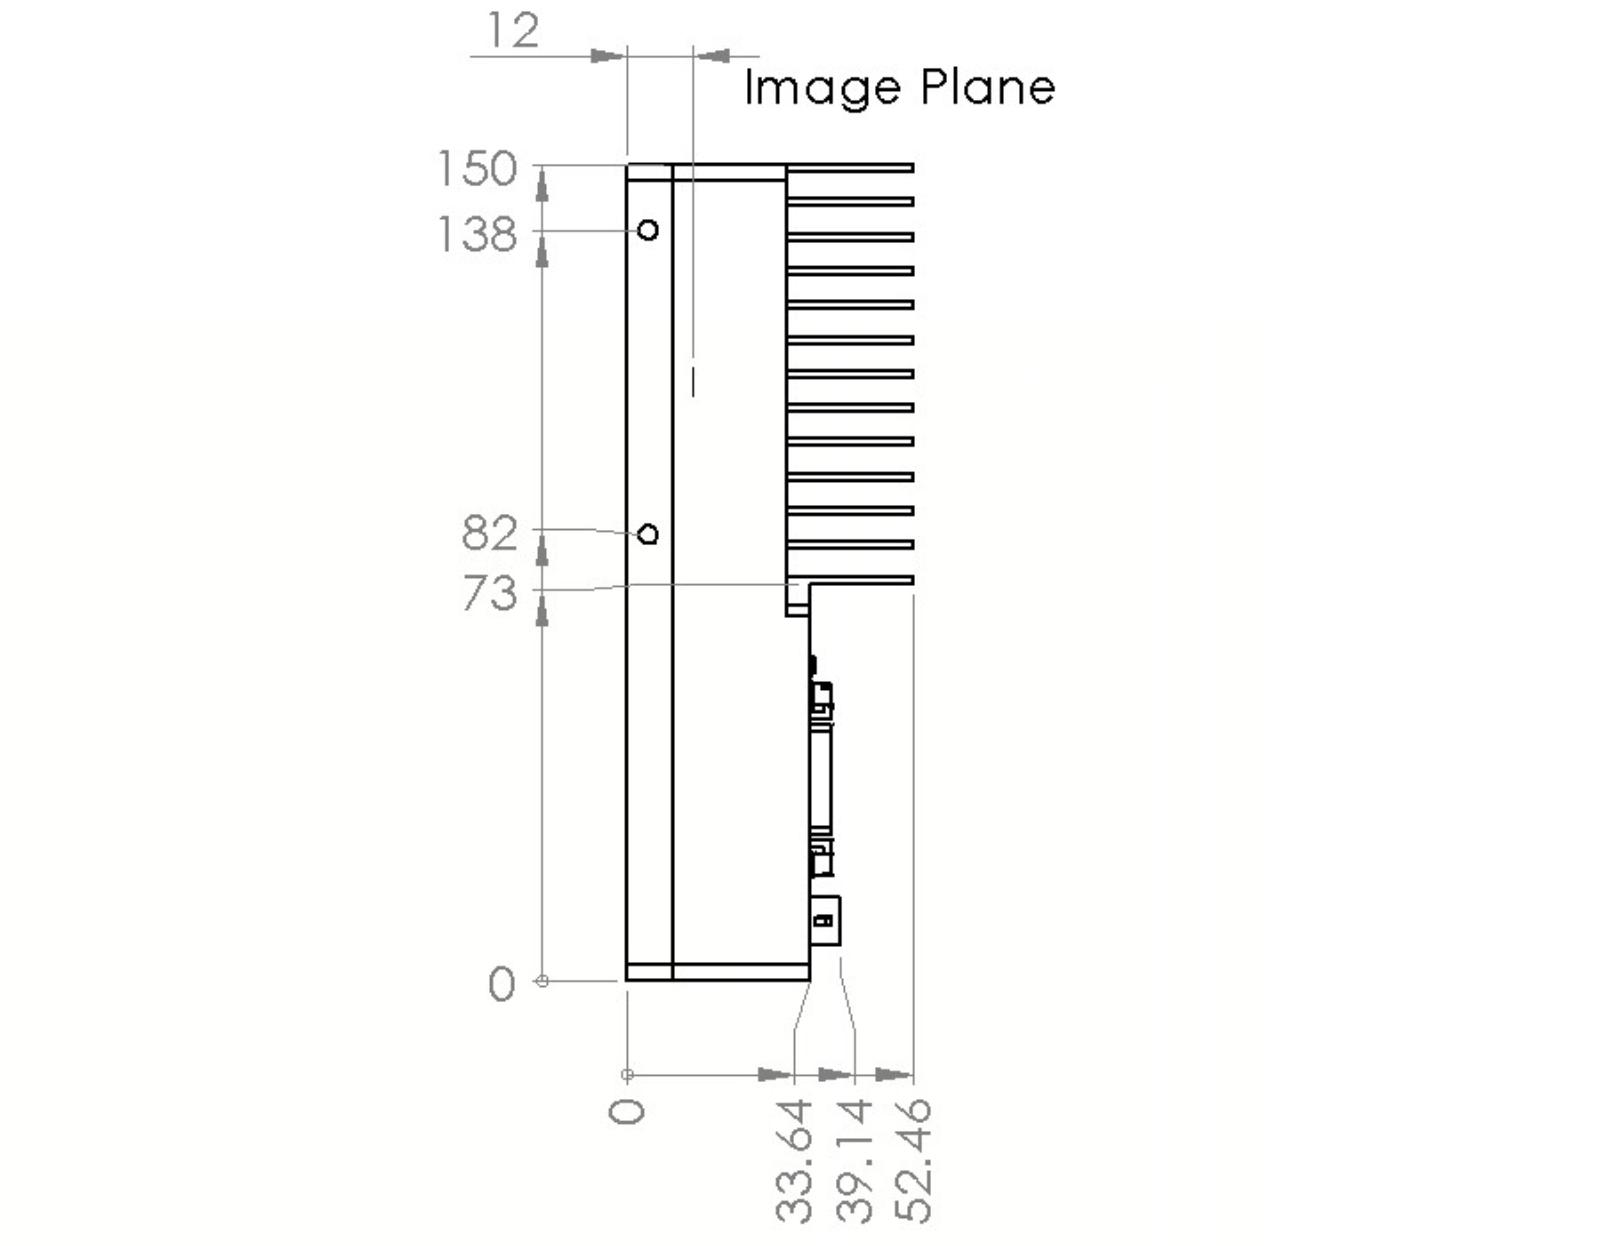 CLS-8k-M39 dimensions